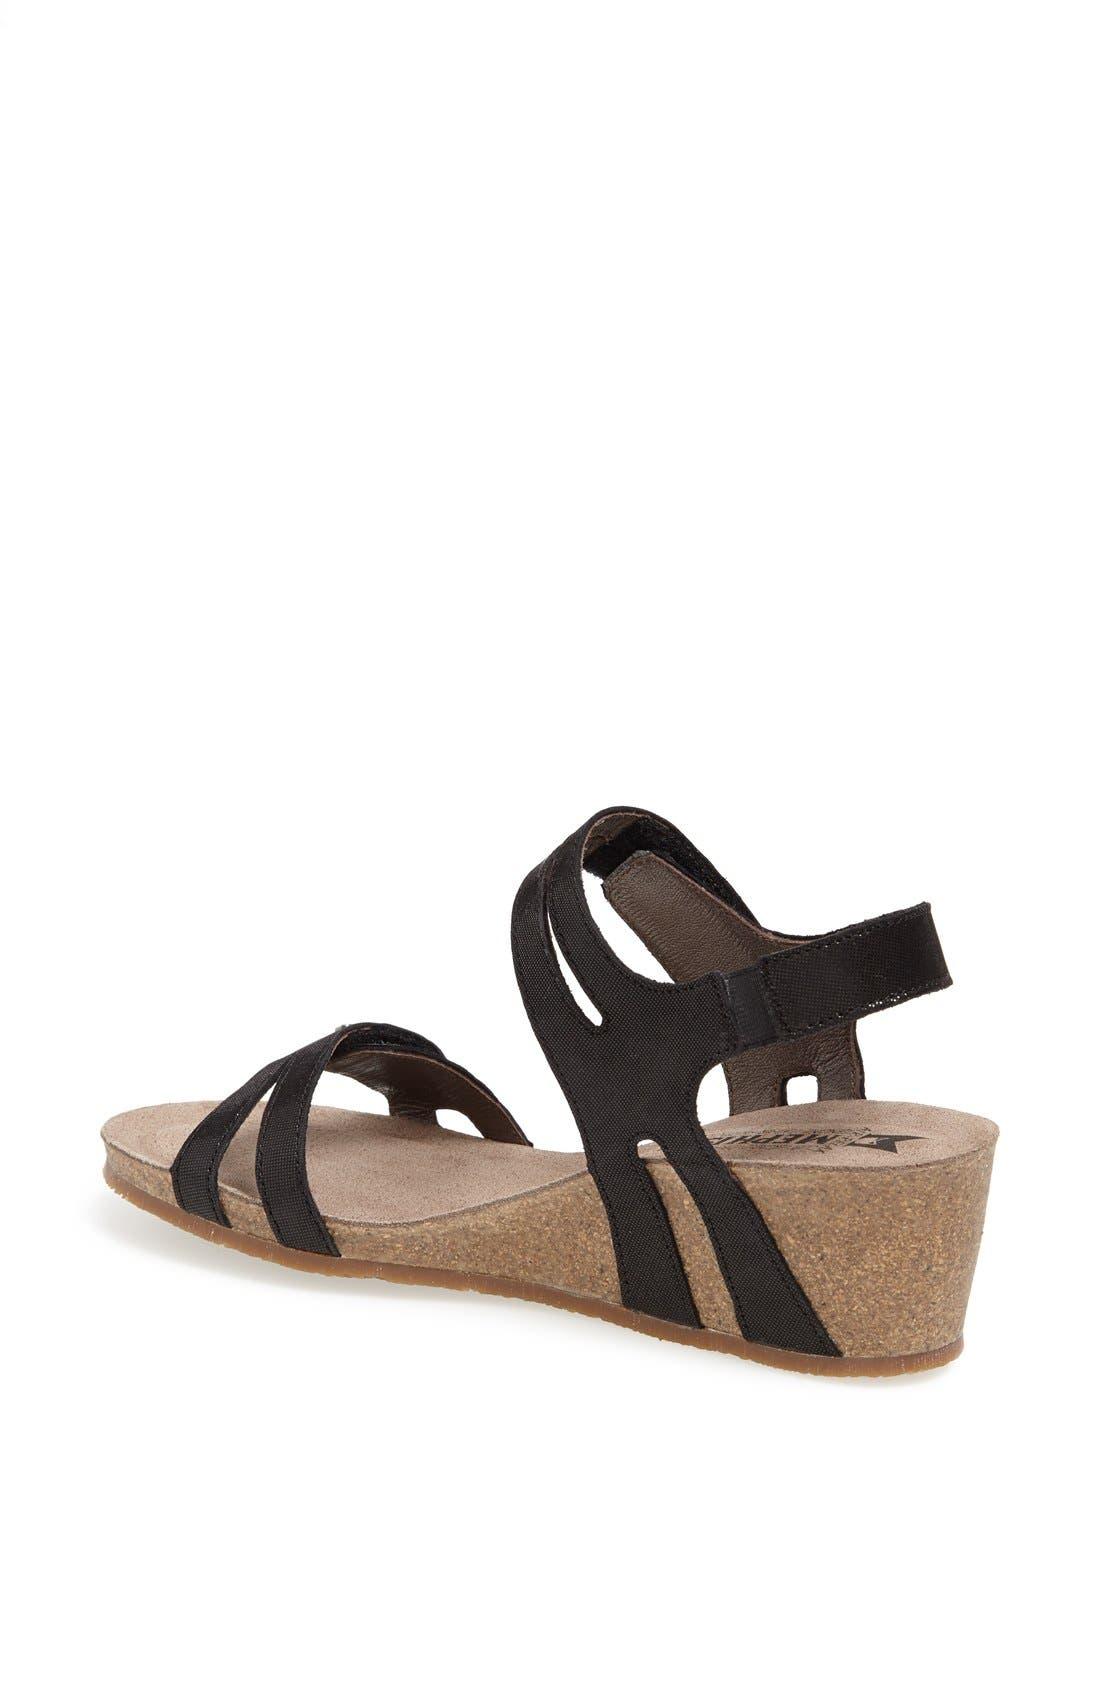 'Minoa' Wedge Sandal,                             Alternate thumbnail 2, color,                             BLACK